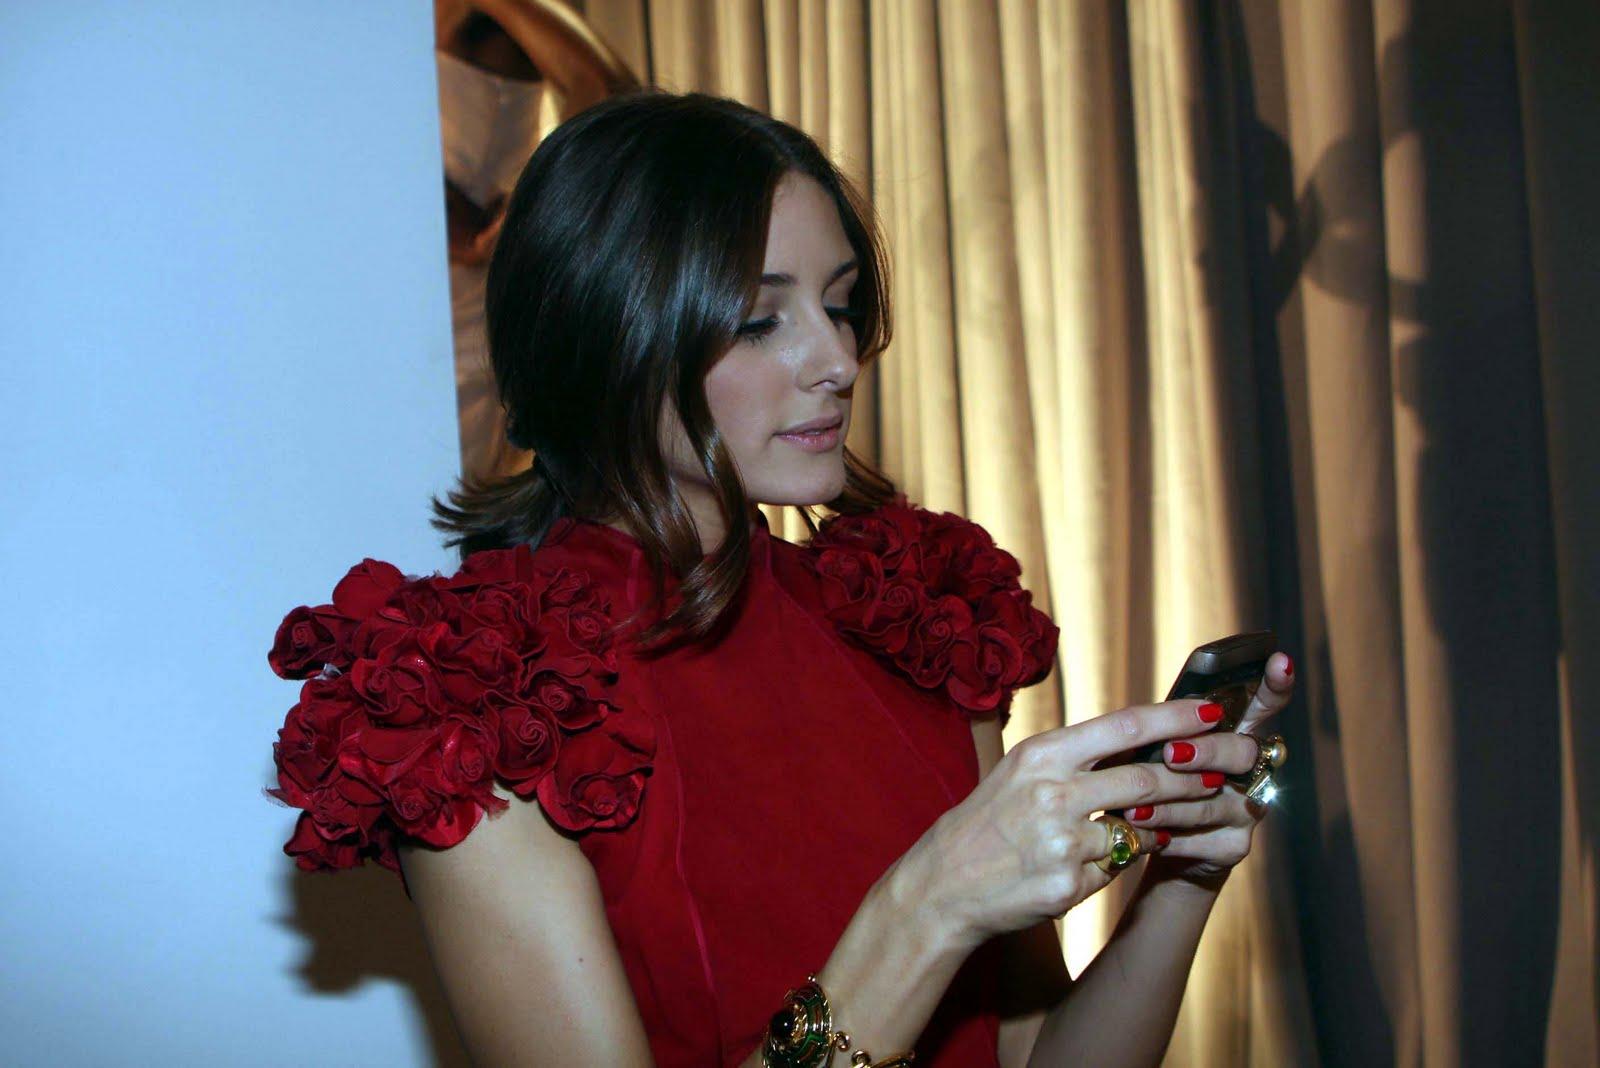 http://3.bp.blogspot.com/_g4TDsRaRR4E/TPegMI-19LI/AAAAAAAABko/DSGOP1Rr3ec/s1600/Olivia+Palermo+Blackberry.jpg